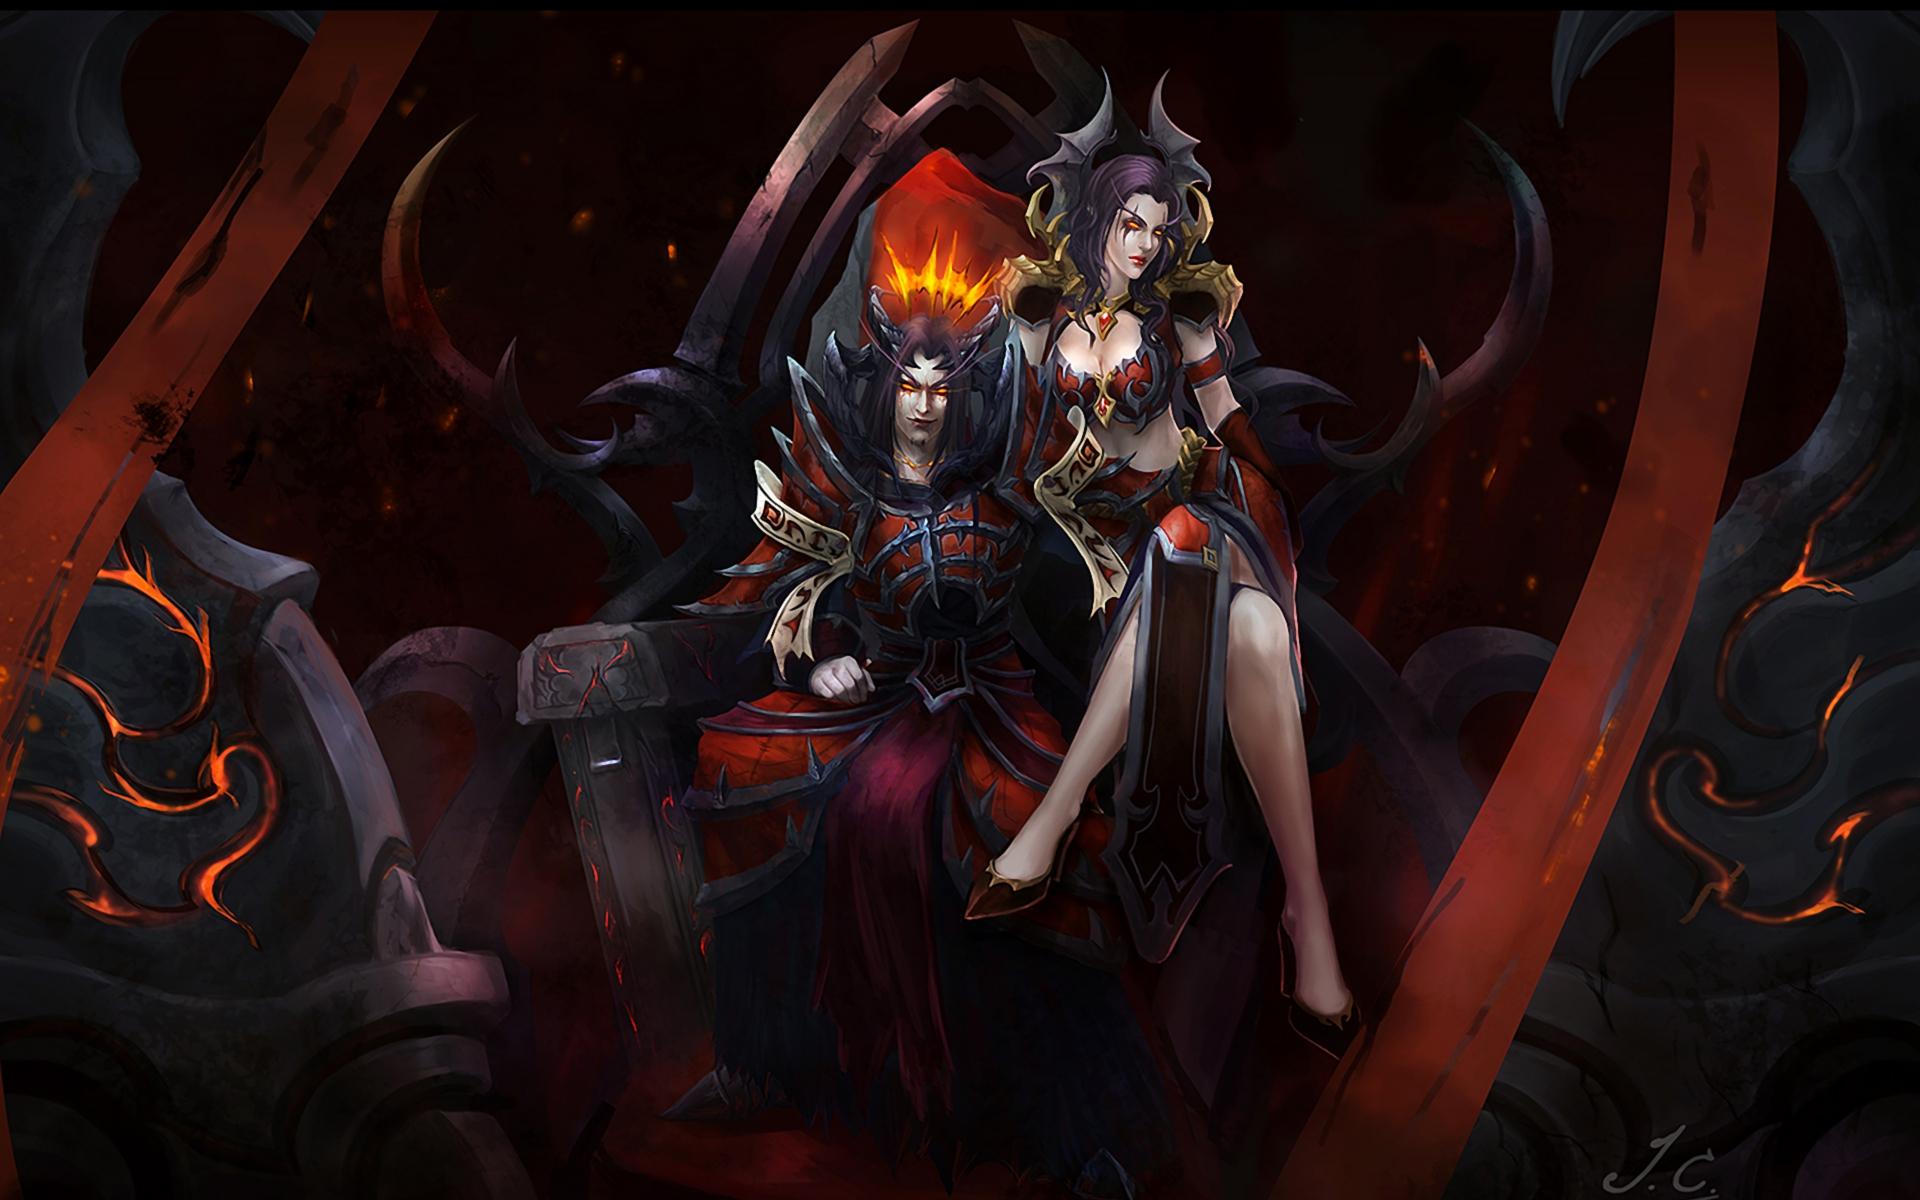 World of warcraft human vs demon hentai adult image